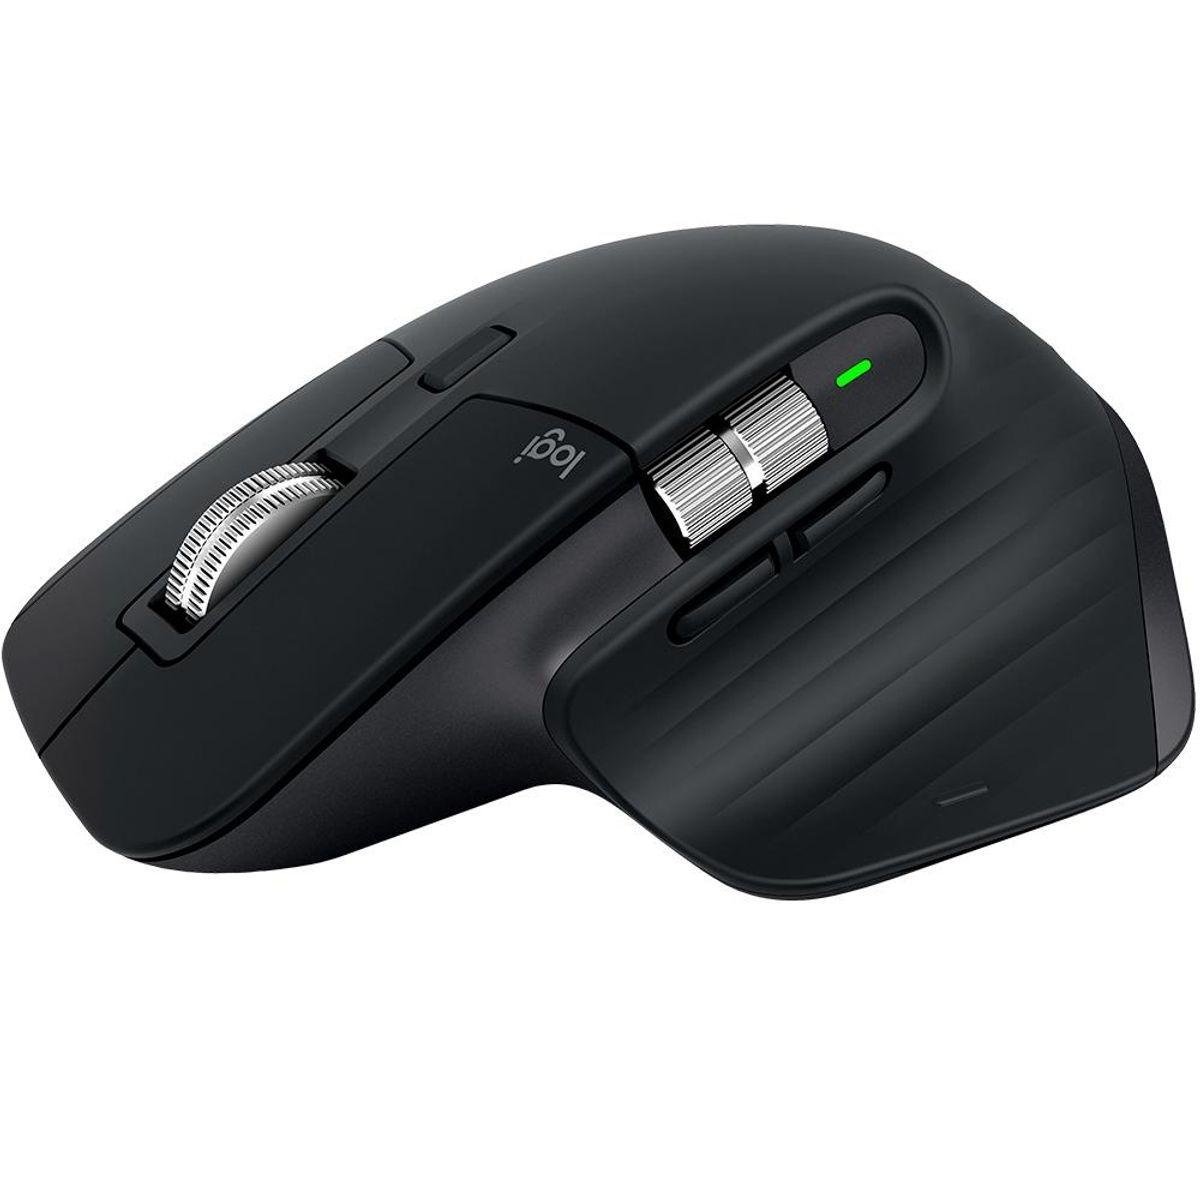 Mouse Wireless Laser Mx Master 910-005647 Logitech